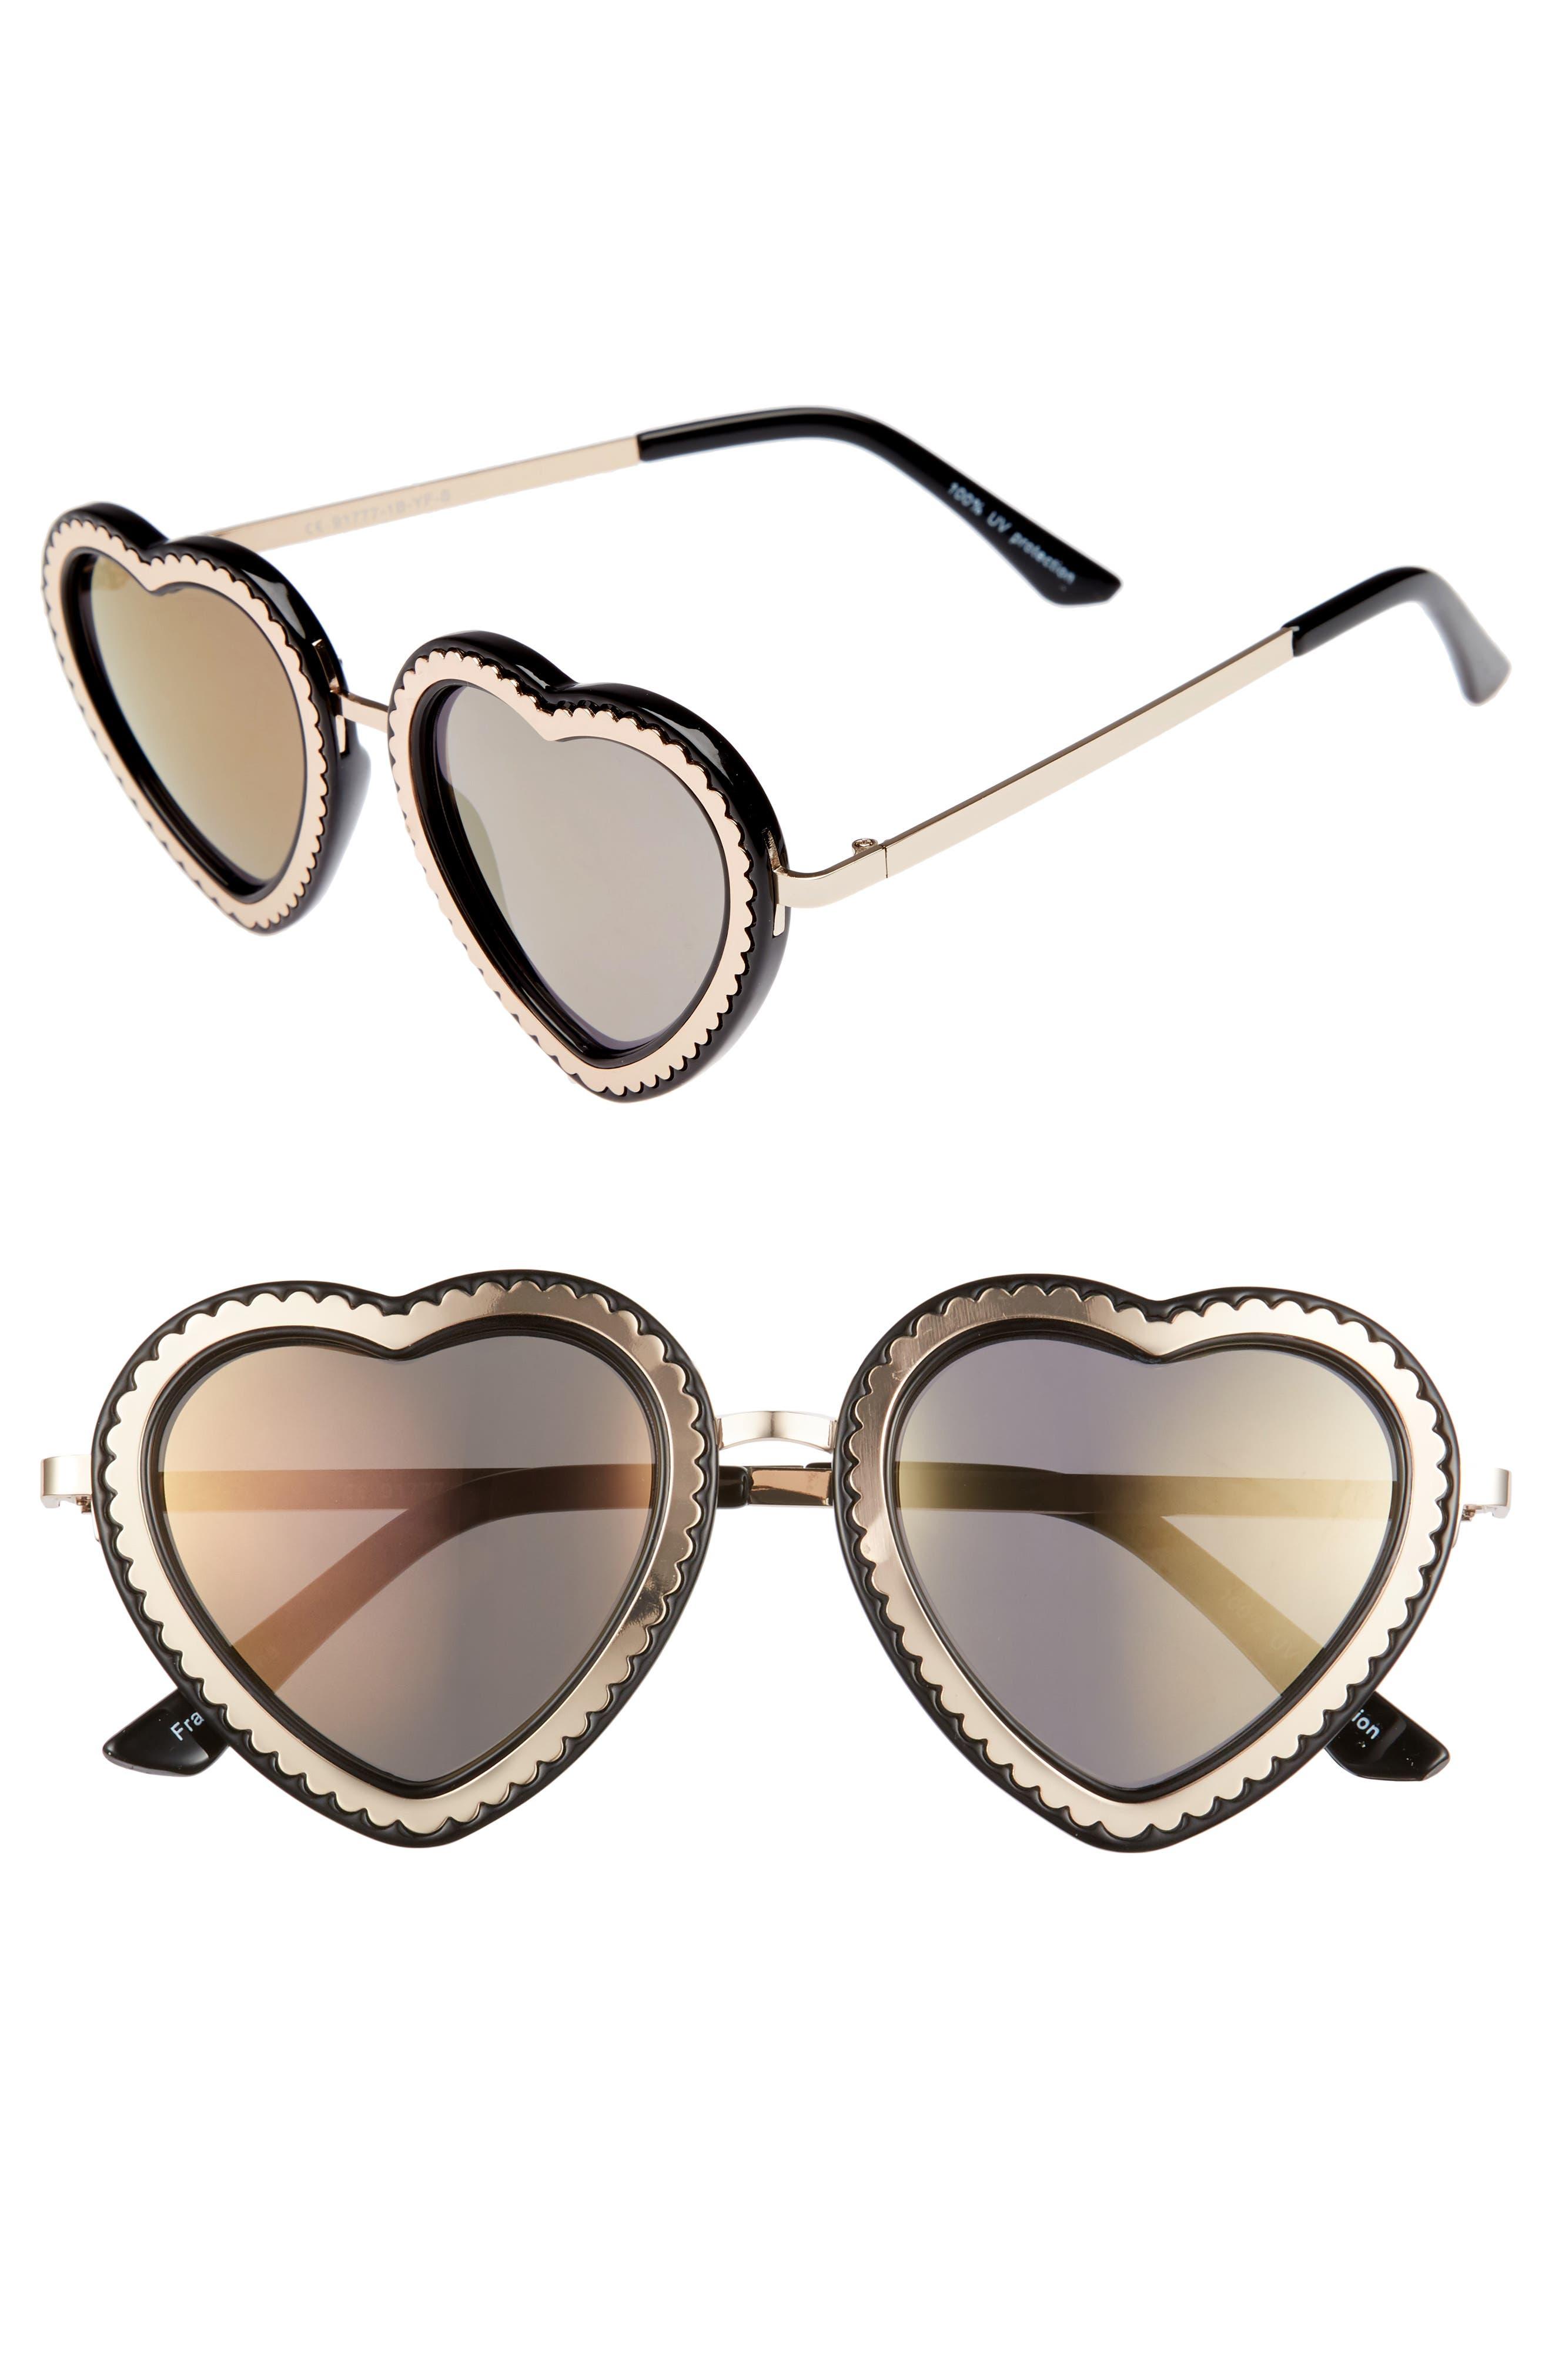 Glance Eyewear 61mm Mirrored Heart Sunglasses